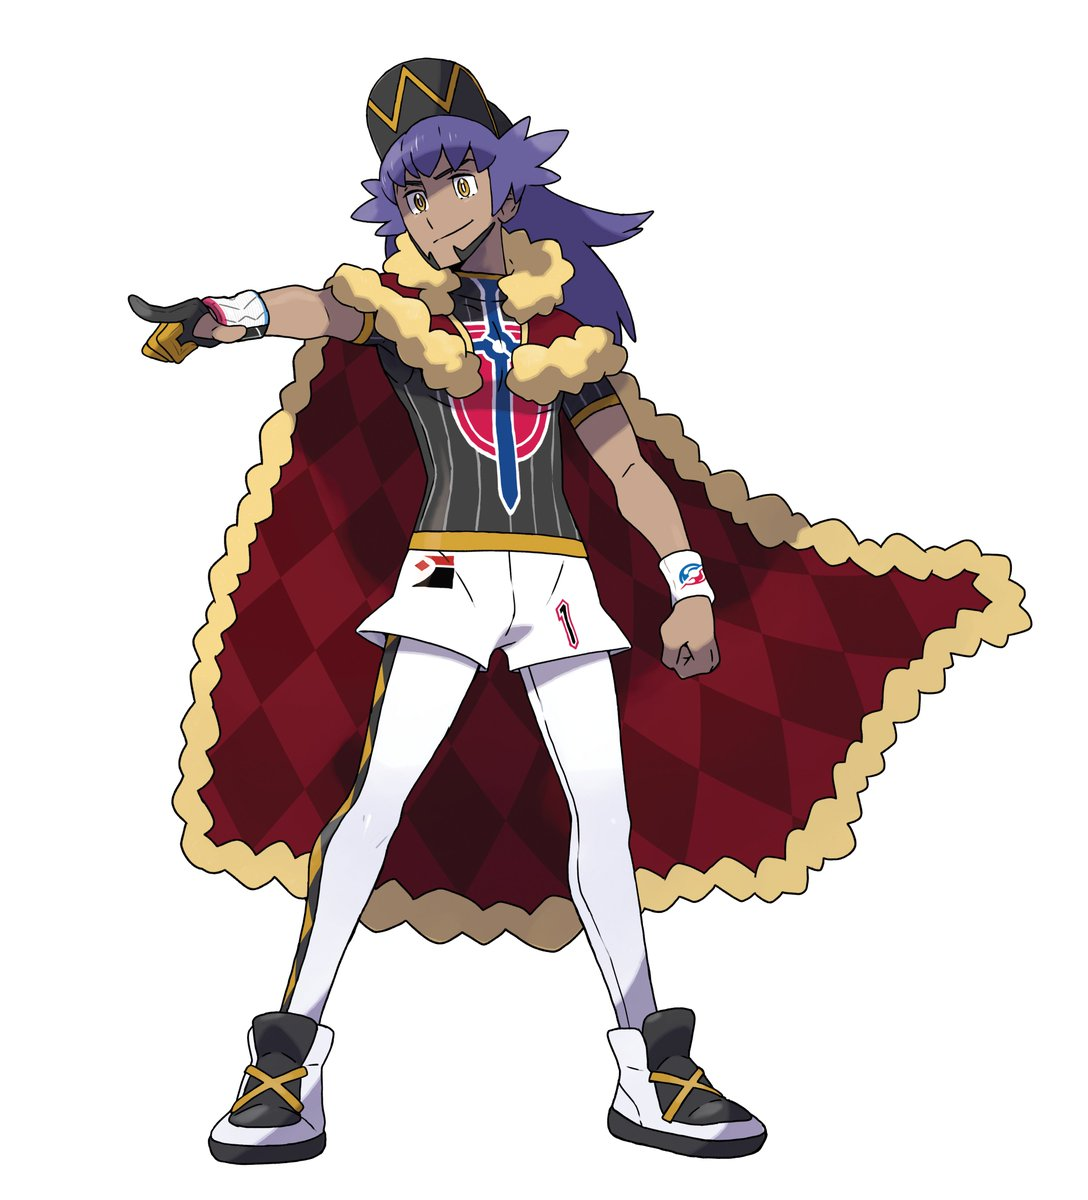 Official Artwork Of The Galar Region Champion Leon In Pokemon Sword